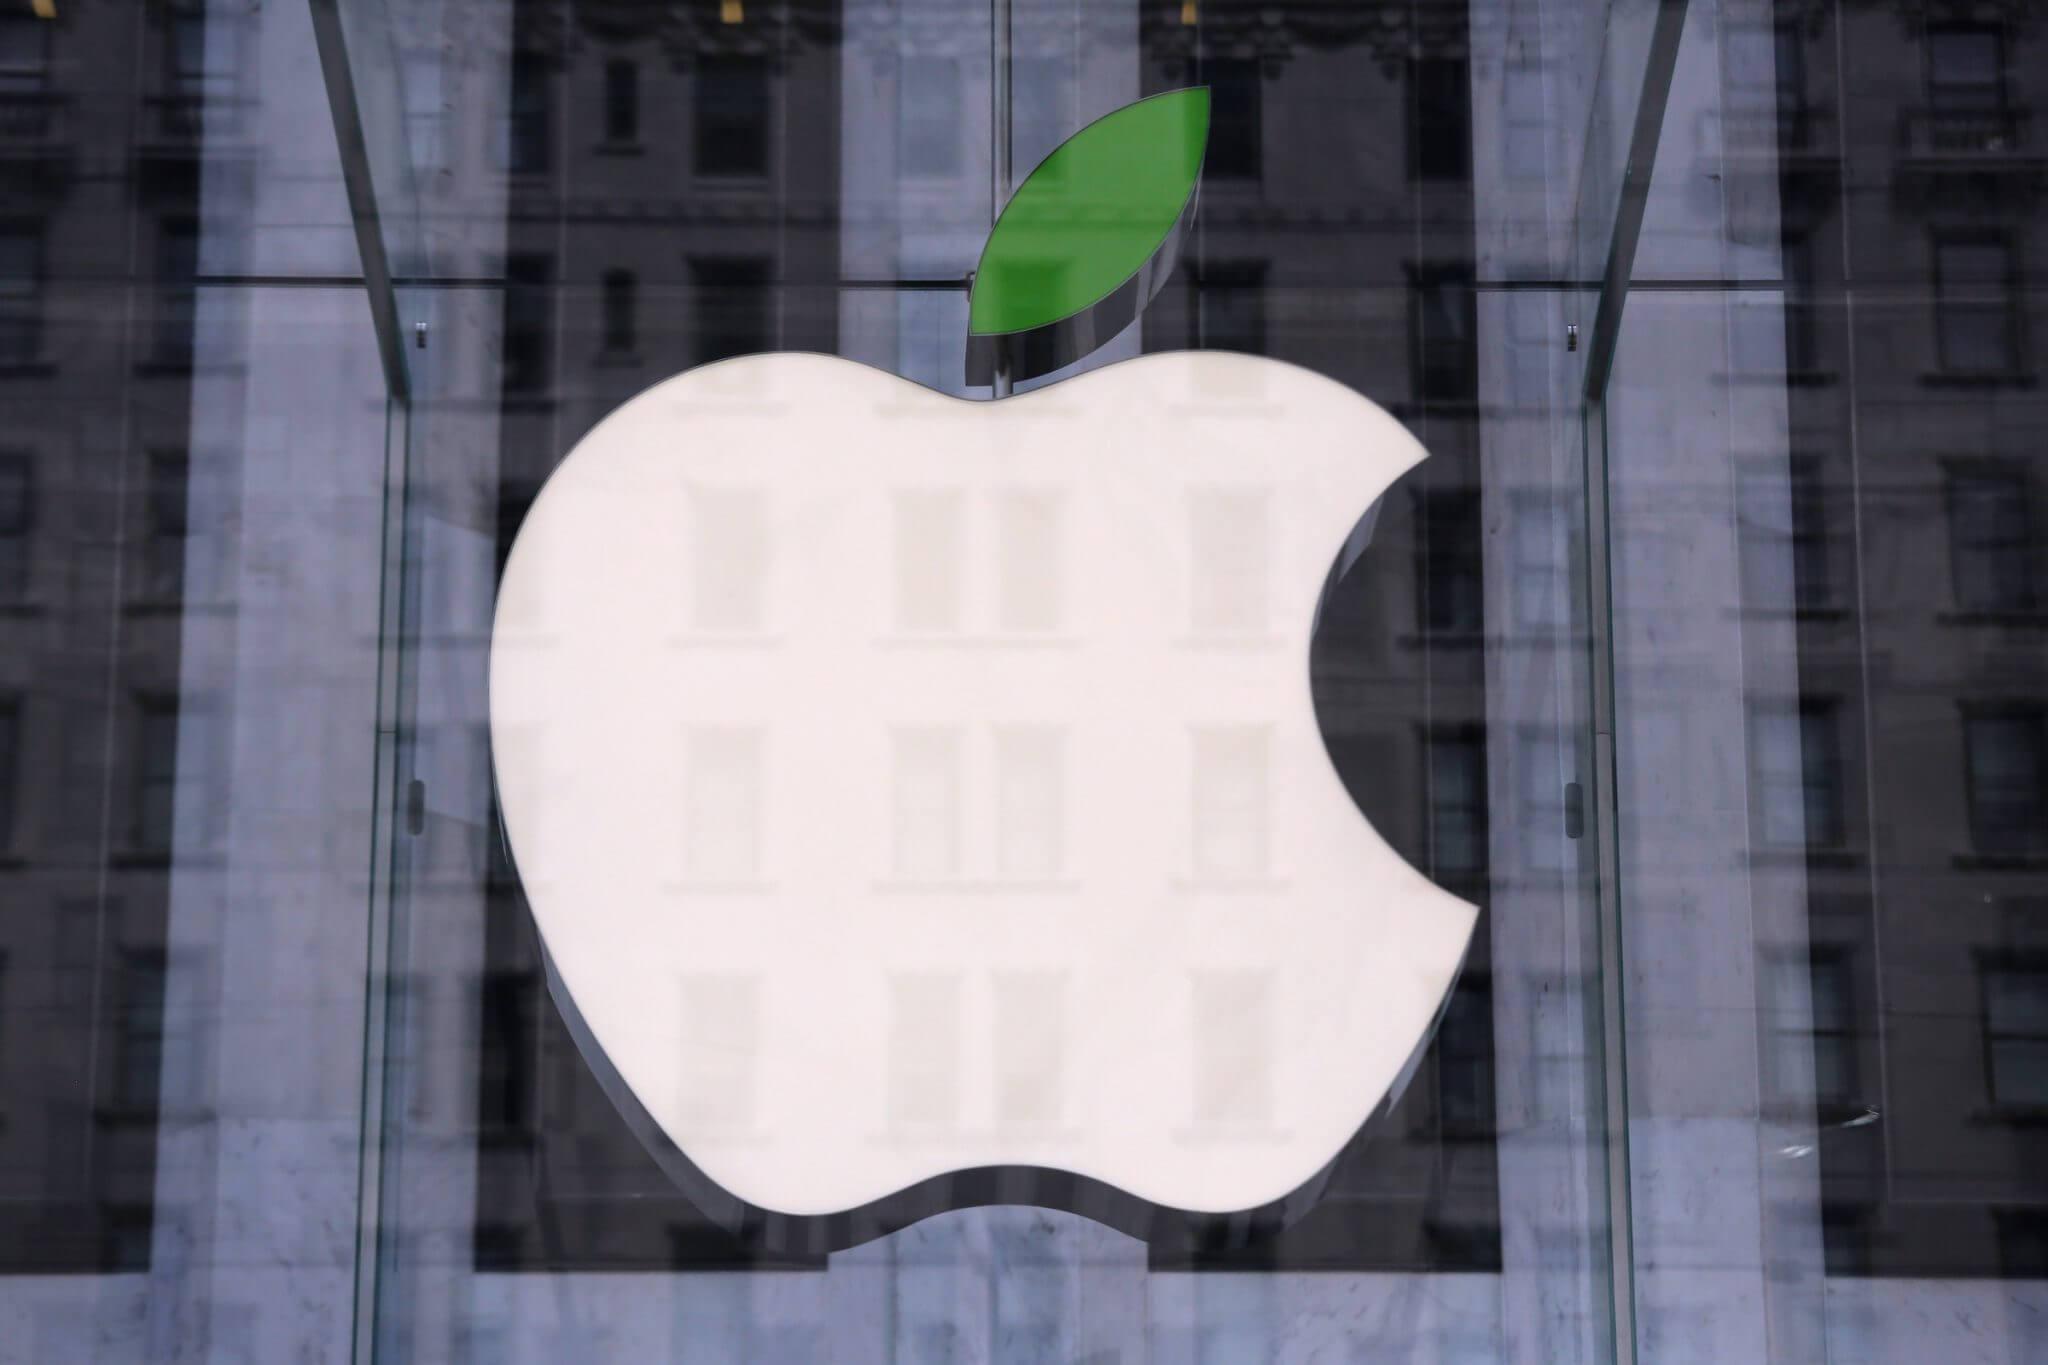 smt appleenergy capa - Apple cria empresa para vender excedente de energia limpa